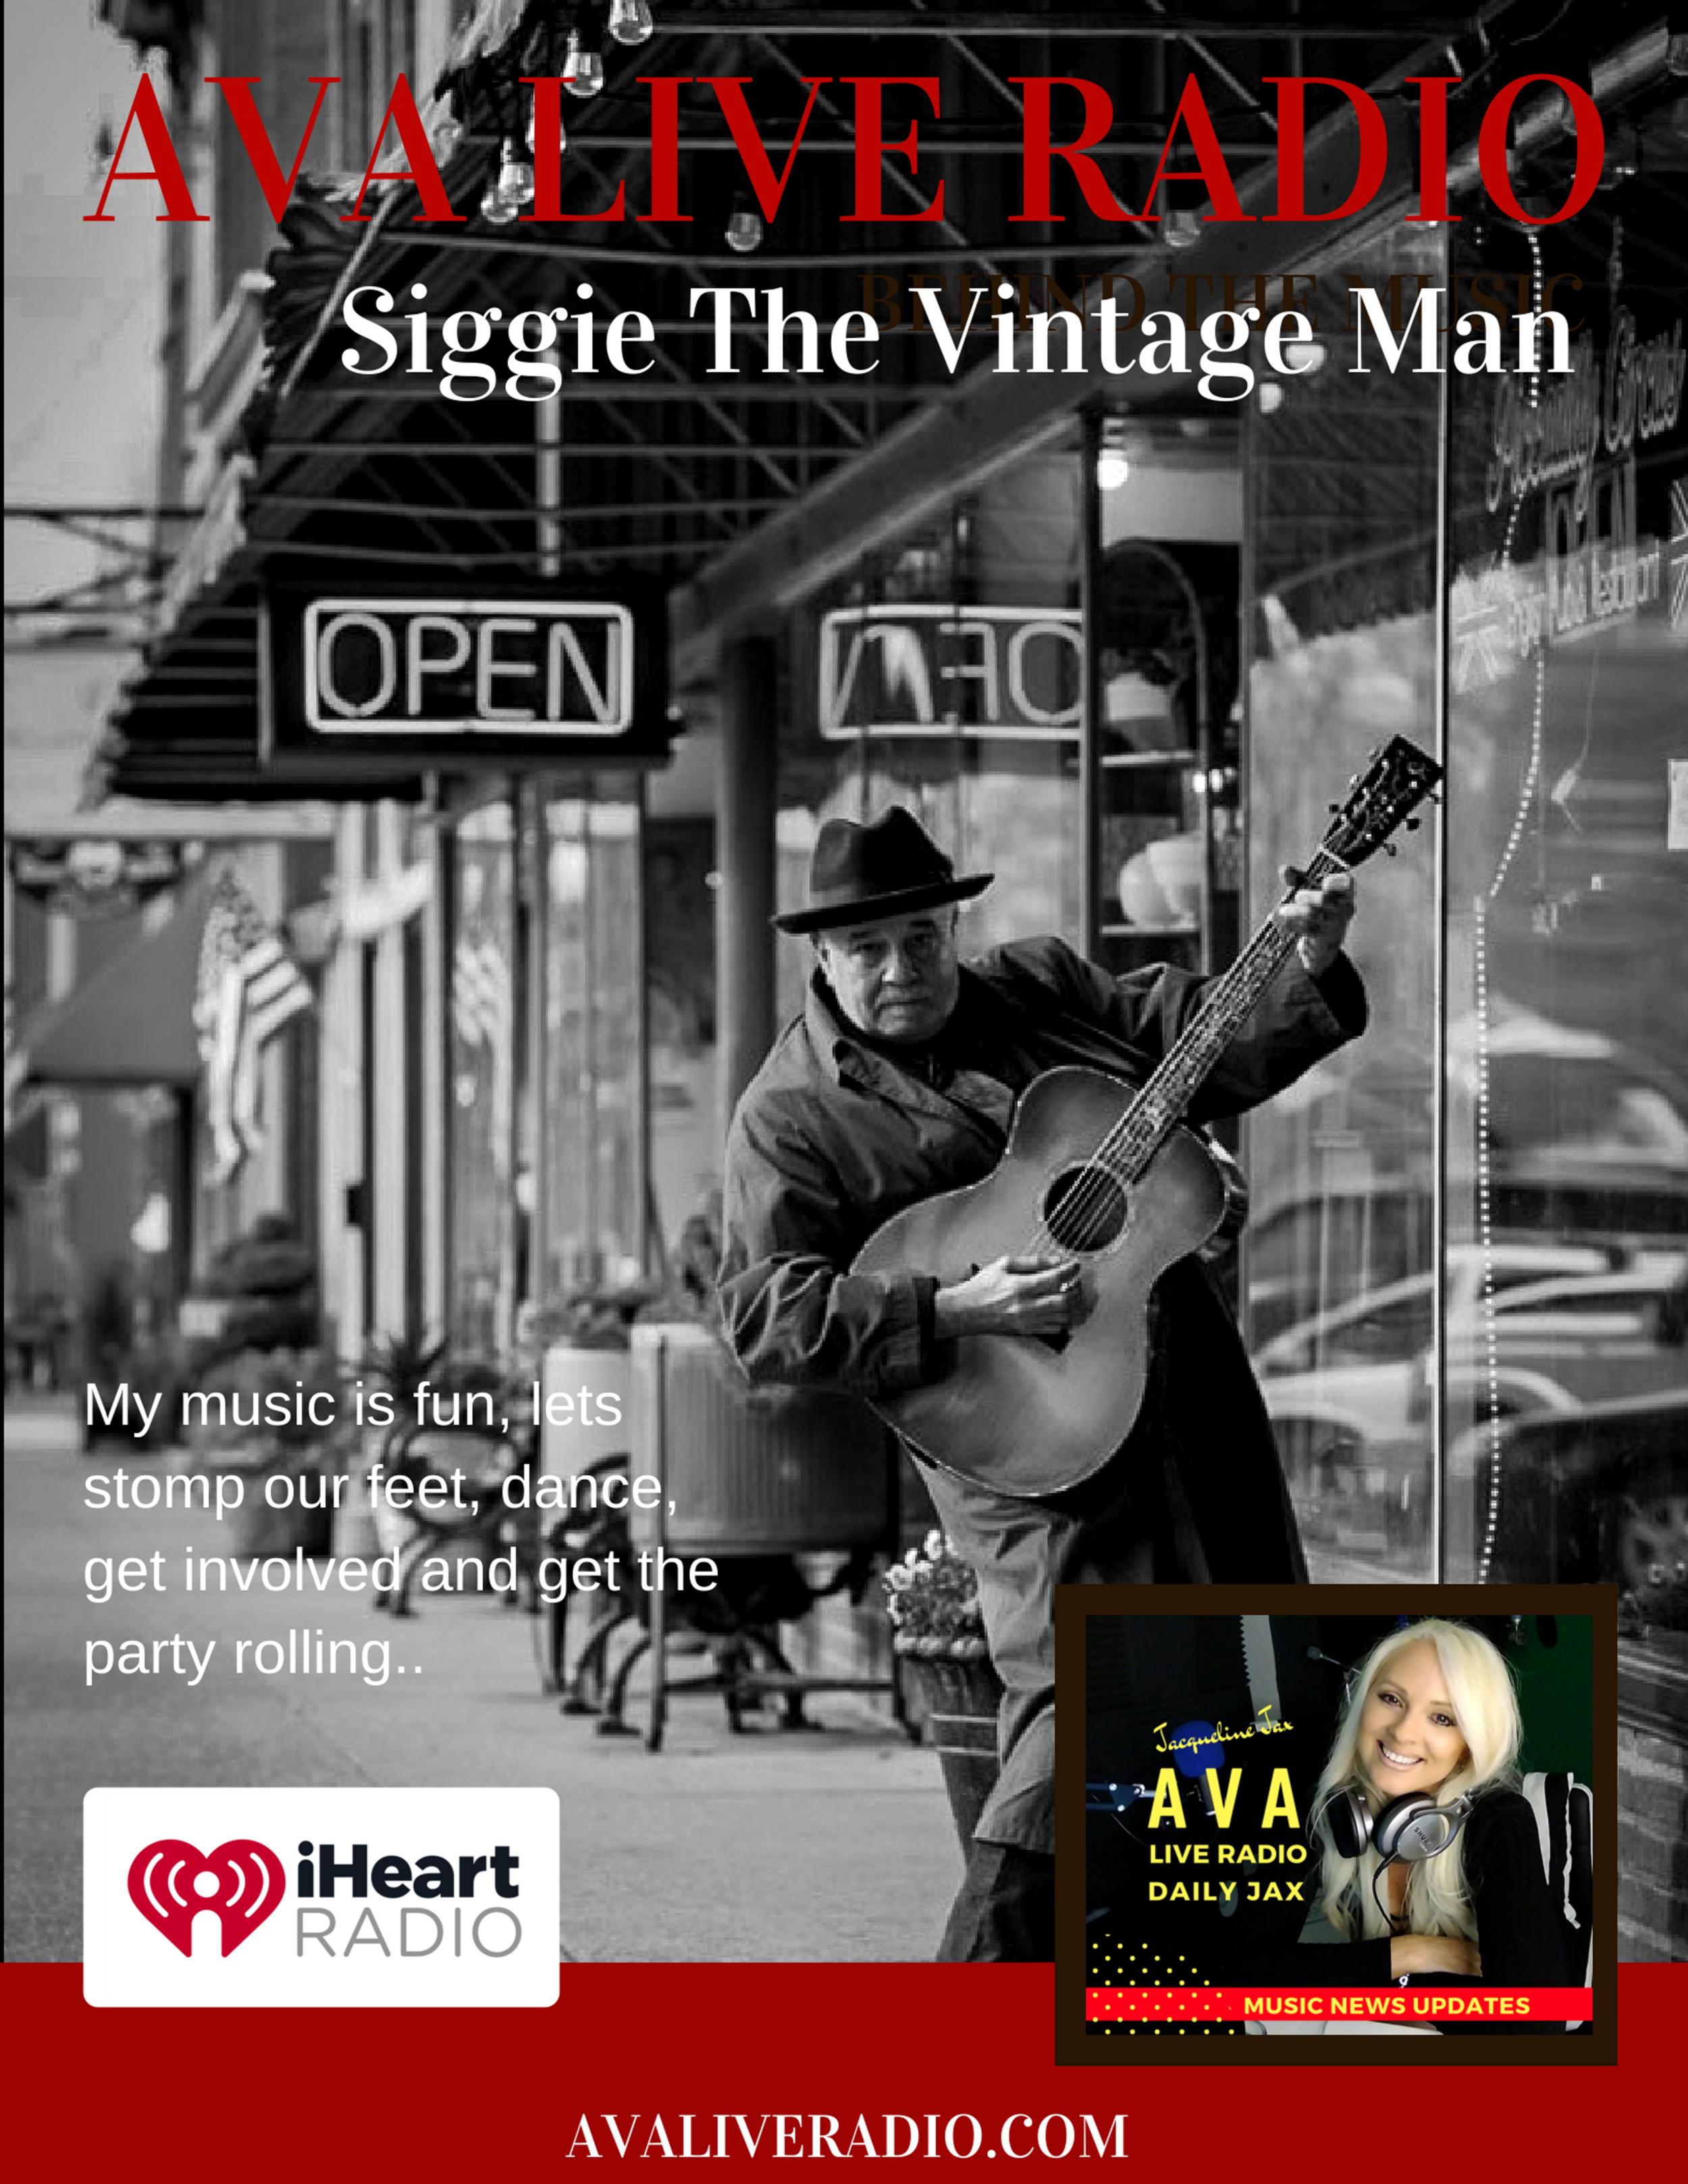 Siggie The Vintage Man AVA LIVE RADIO.png